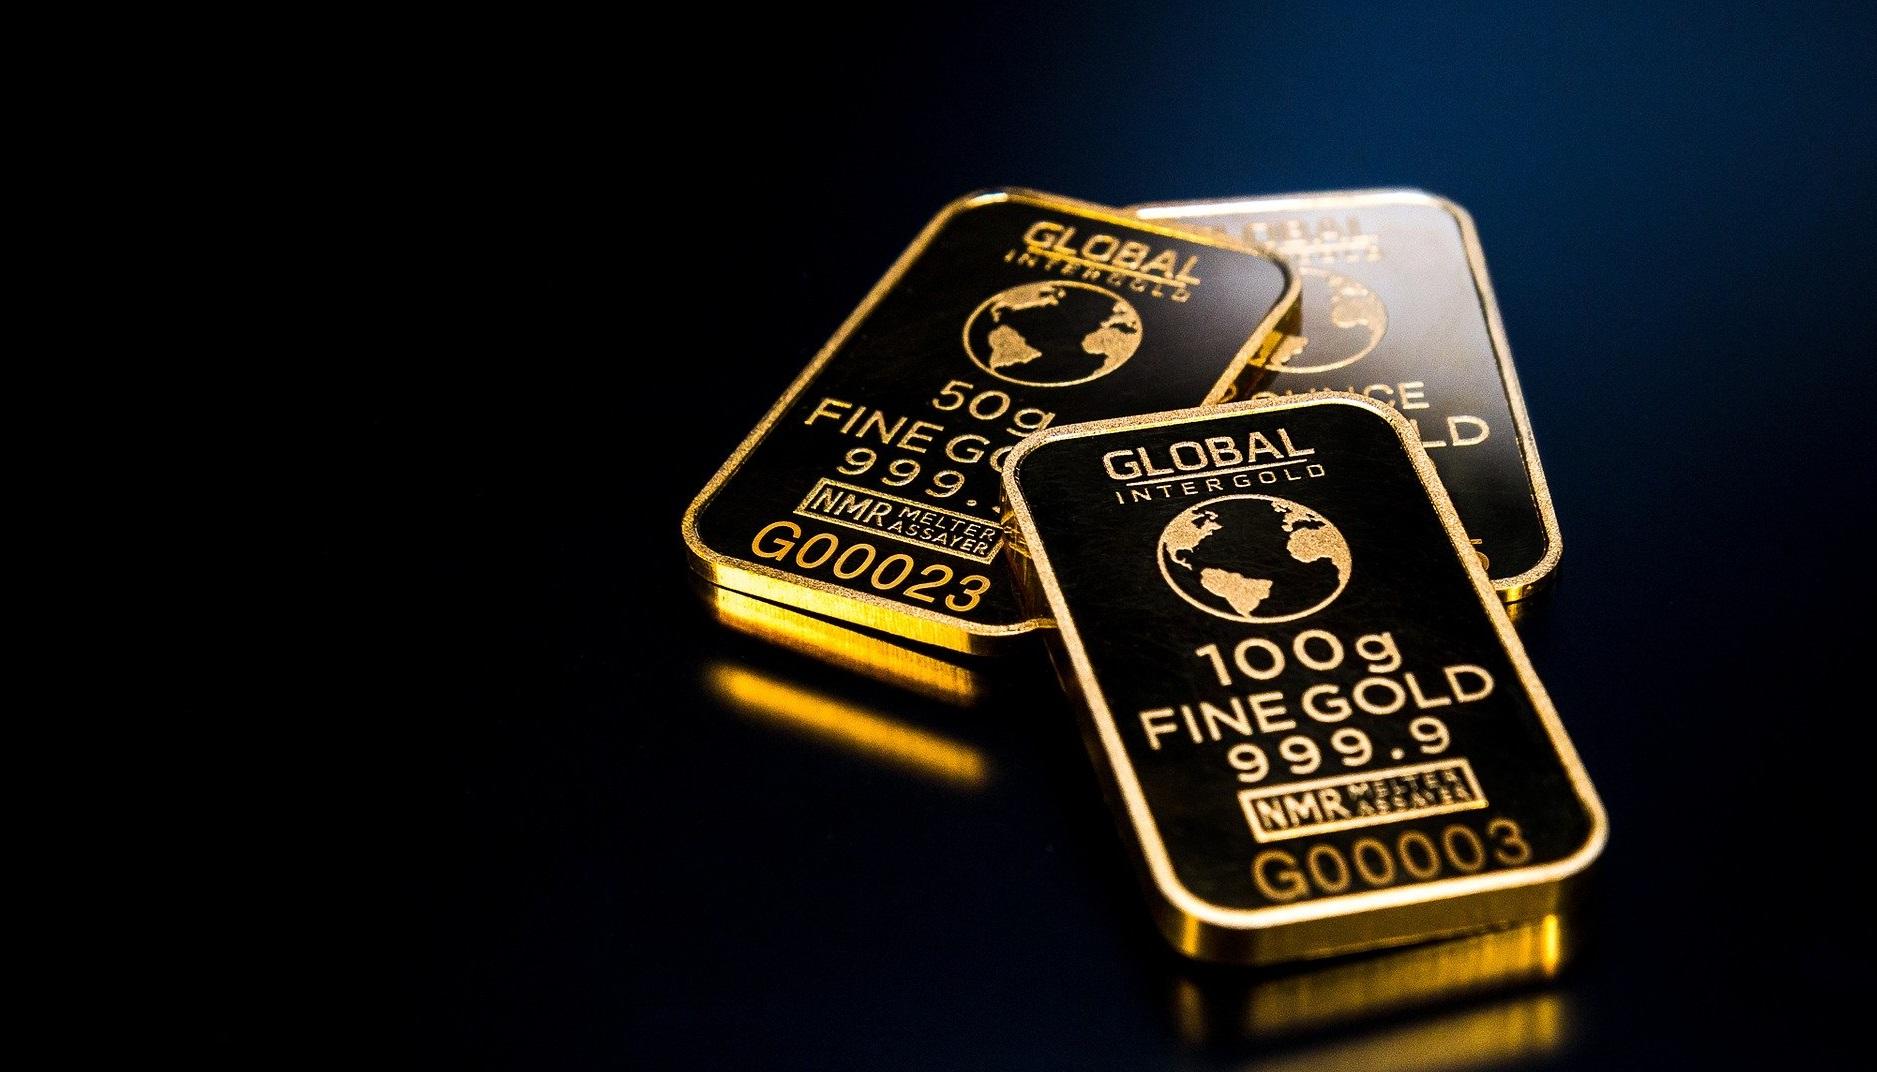 zlato-majetek-cihly